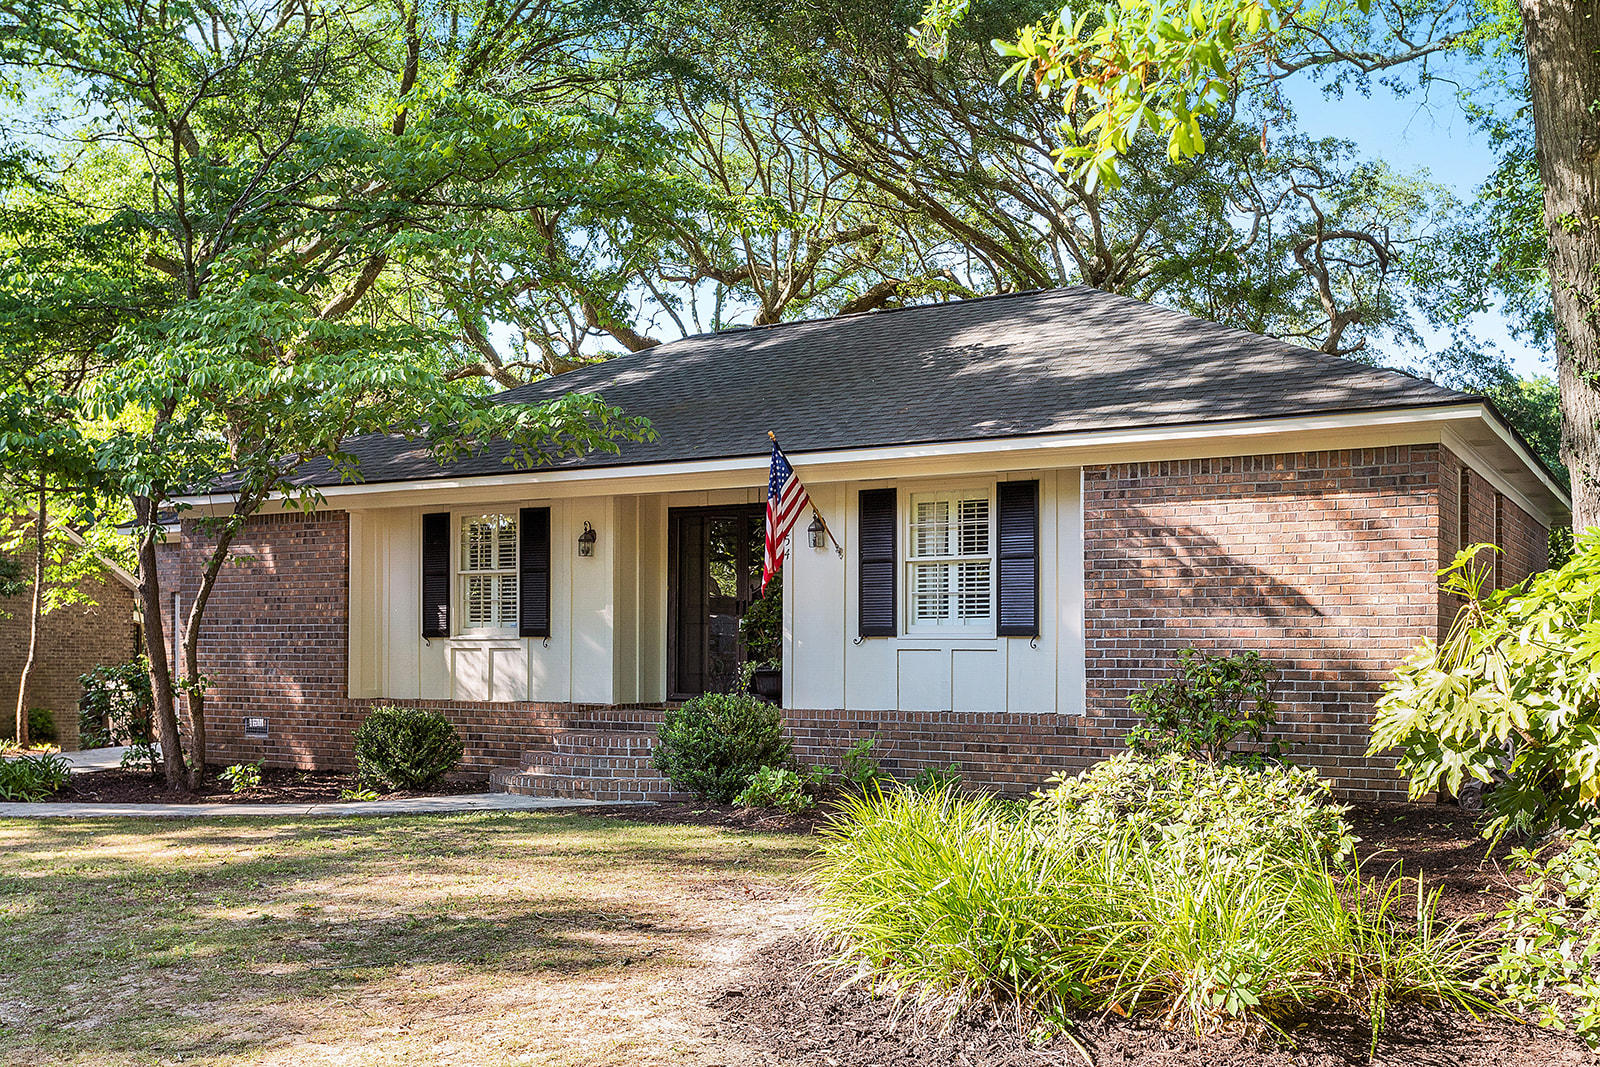 Shemwood II Homes For Sale - 954 Sea Gull, Mount Pleasant, SC - 7